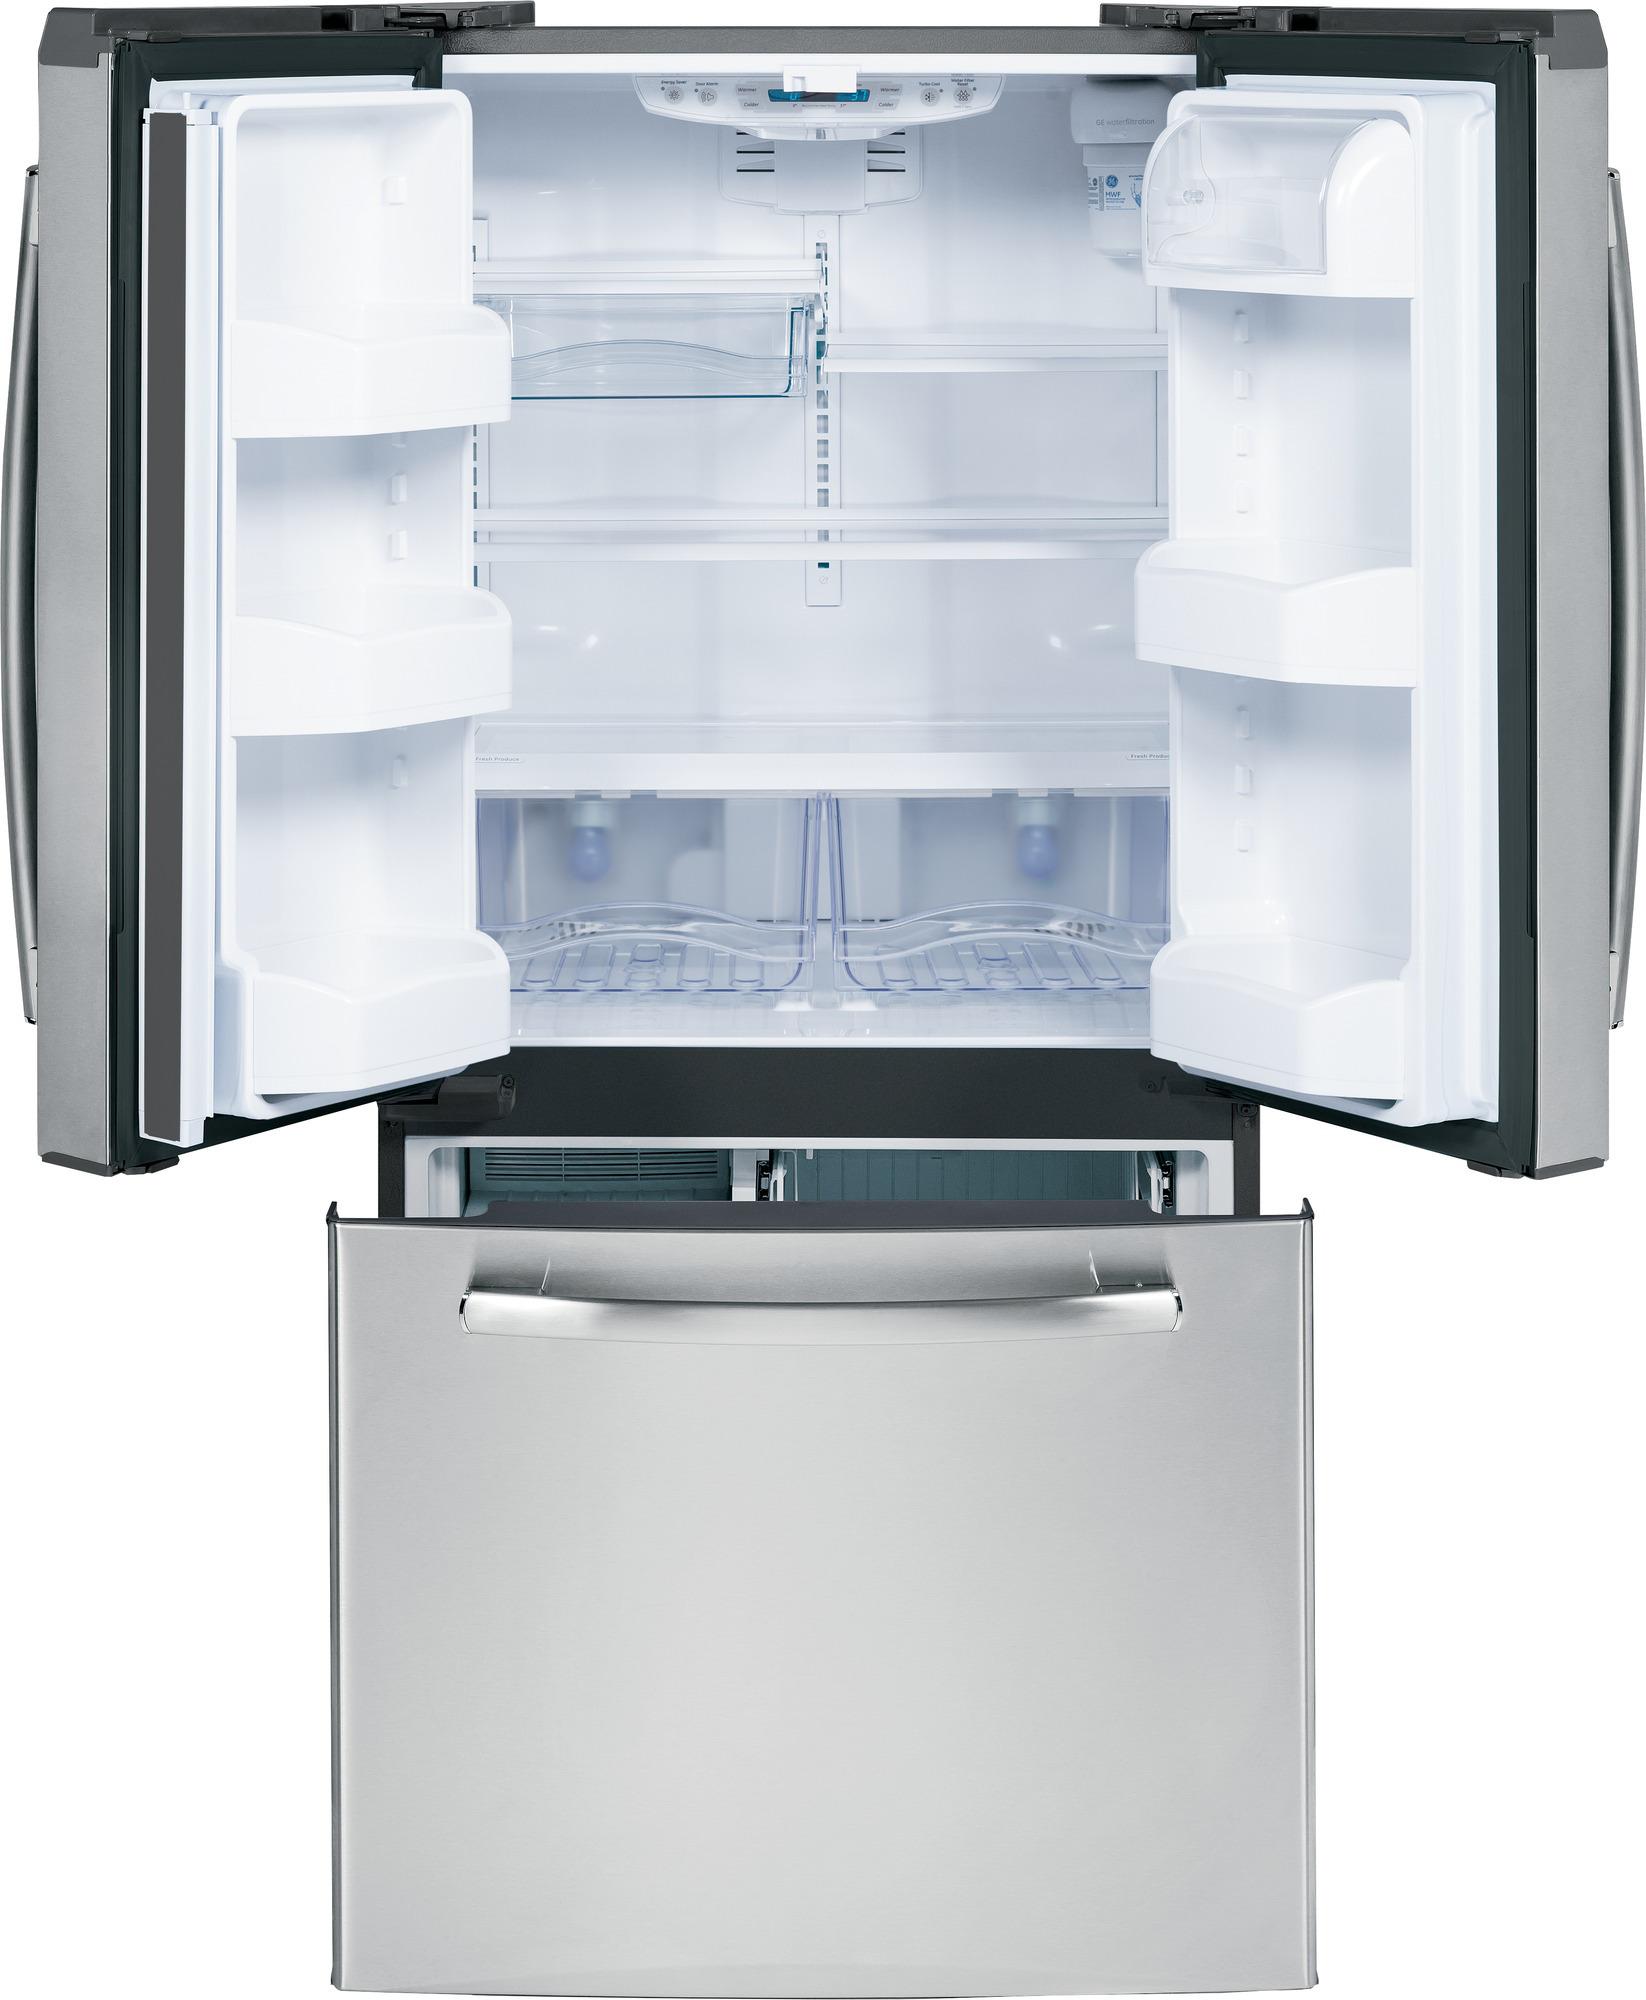 GE Appliances GNS23GSHSS 22.7 cu. ft. French-Door Refrigerator - Stainless Steel